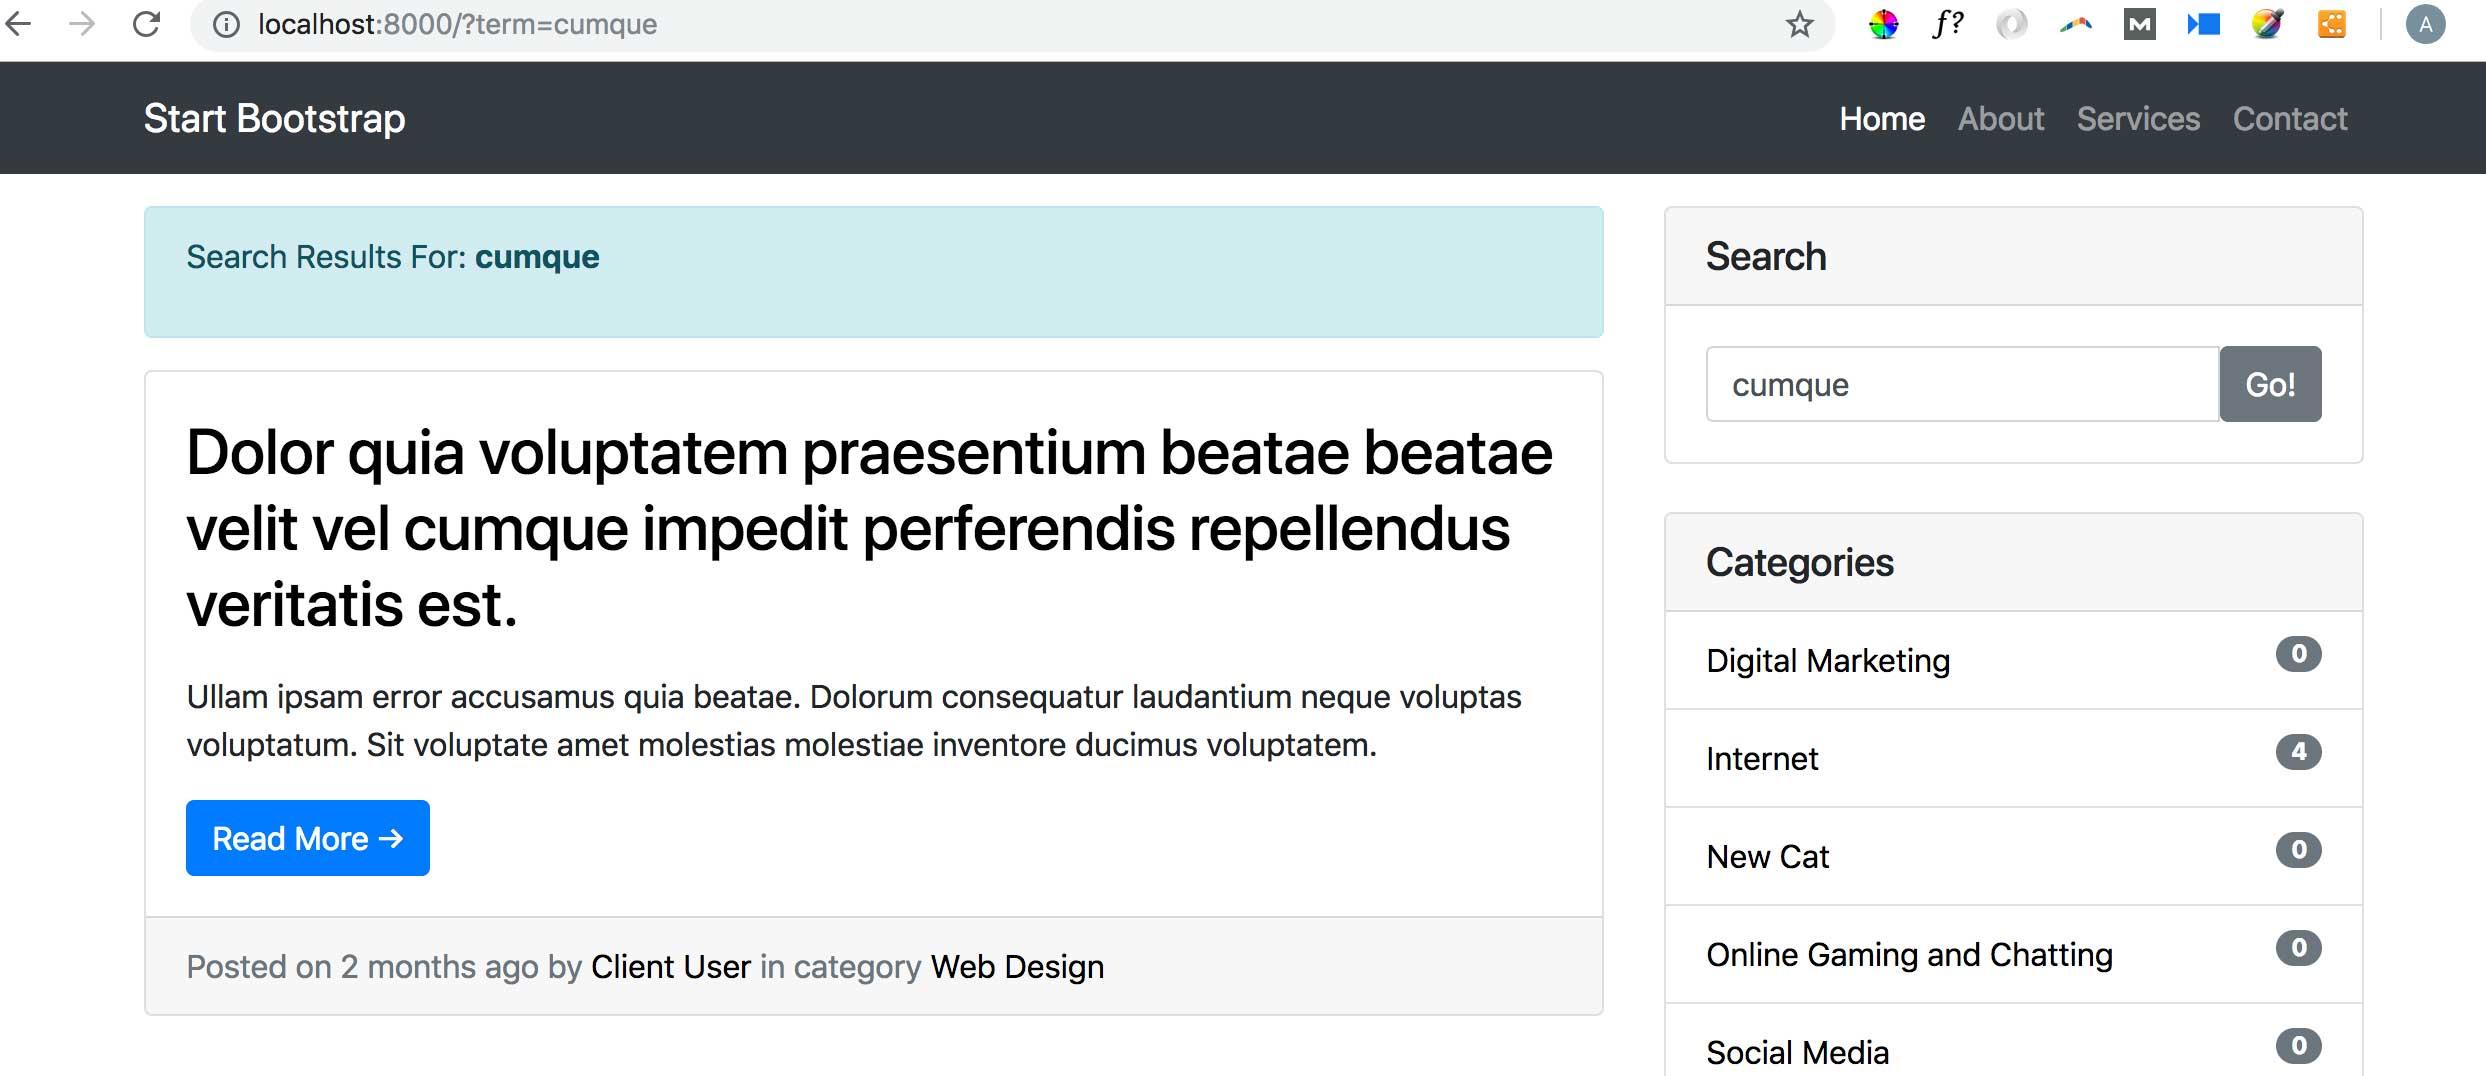 Search-Form---Wordpress-Like-Blog-Laravel-5.7-and-AdminLTE-3-(19-3)